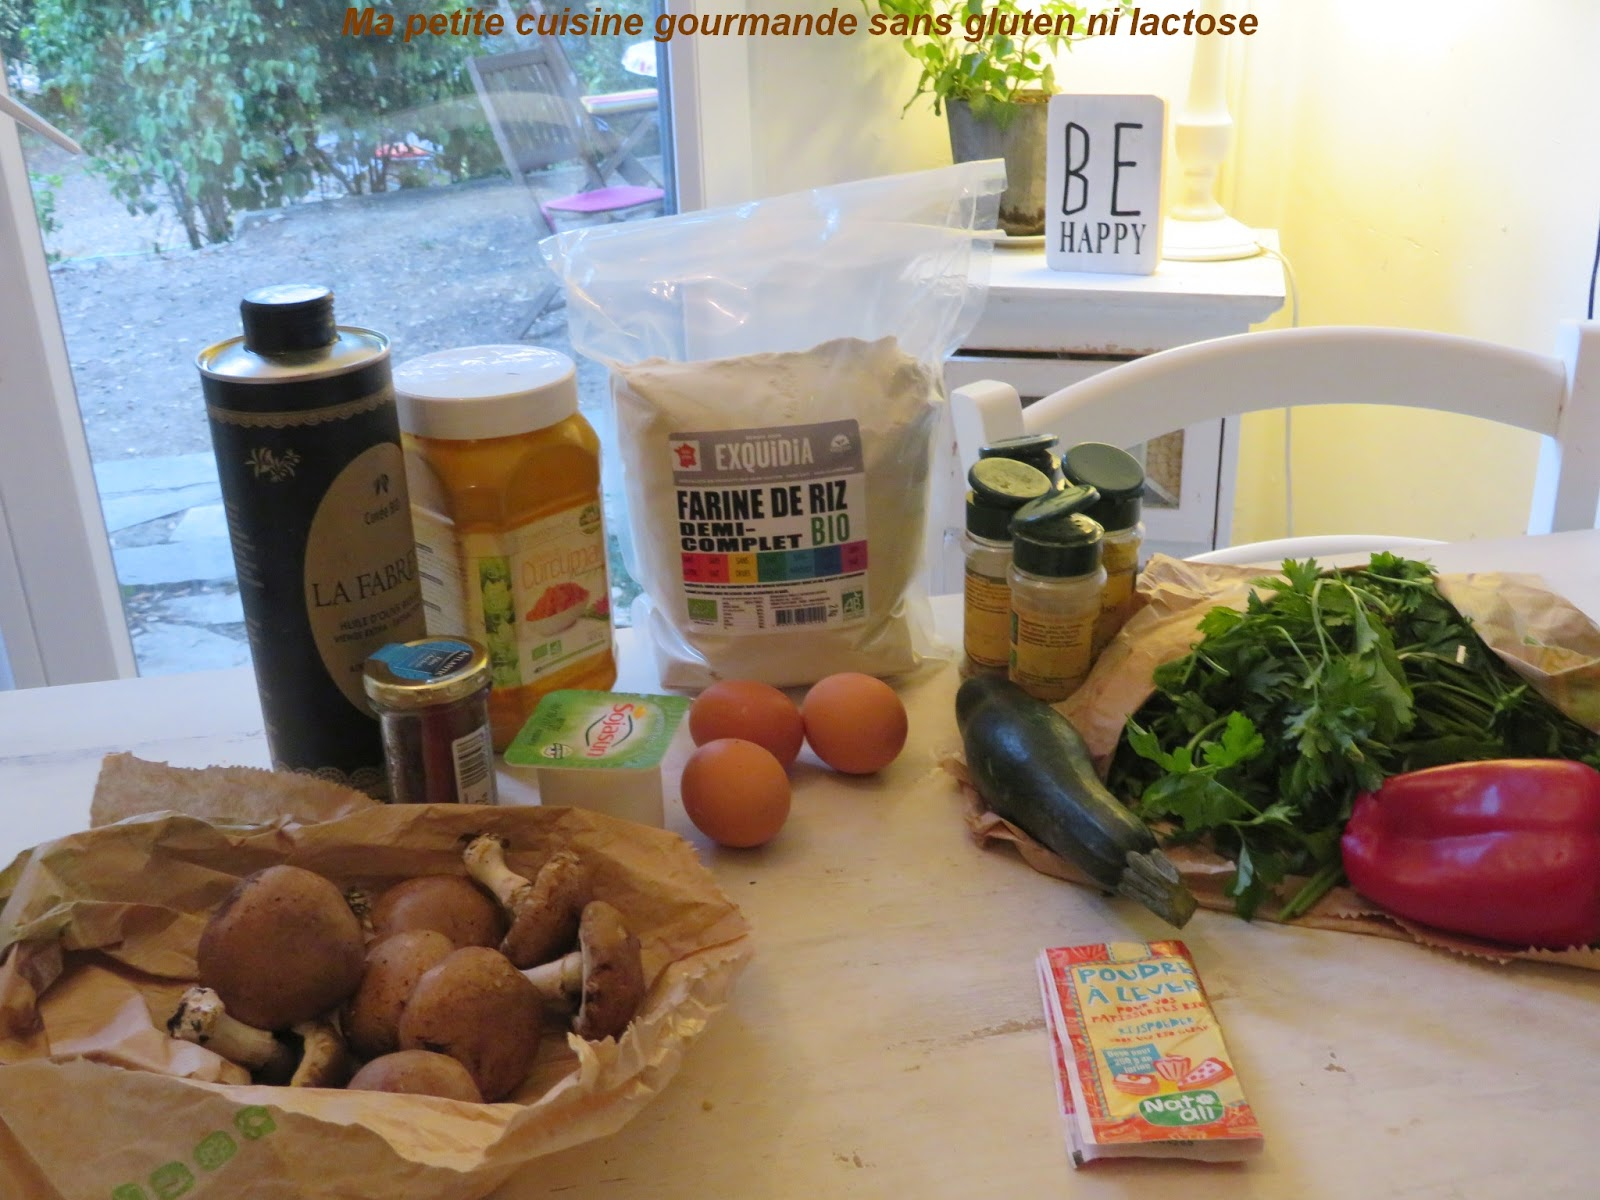 Ma petite cuisine gourmande sans gluten ni lactose cake - Ma petite cuisine gourmande sans gluten ni lactose ...